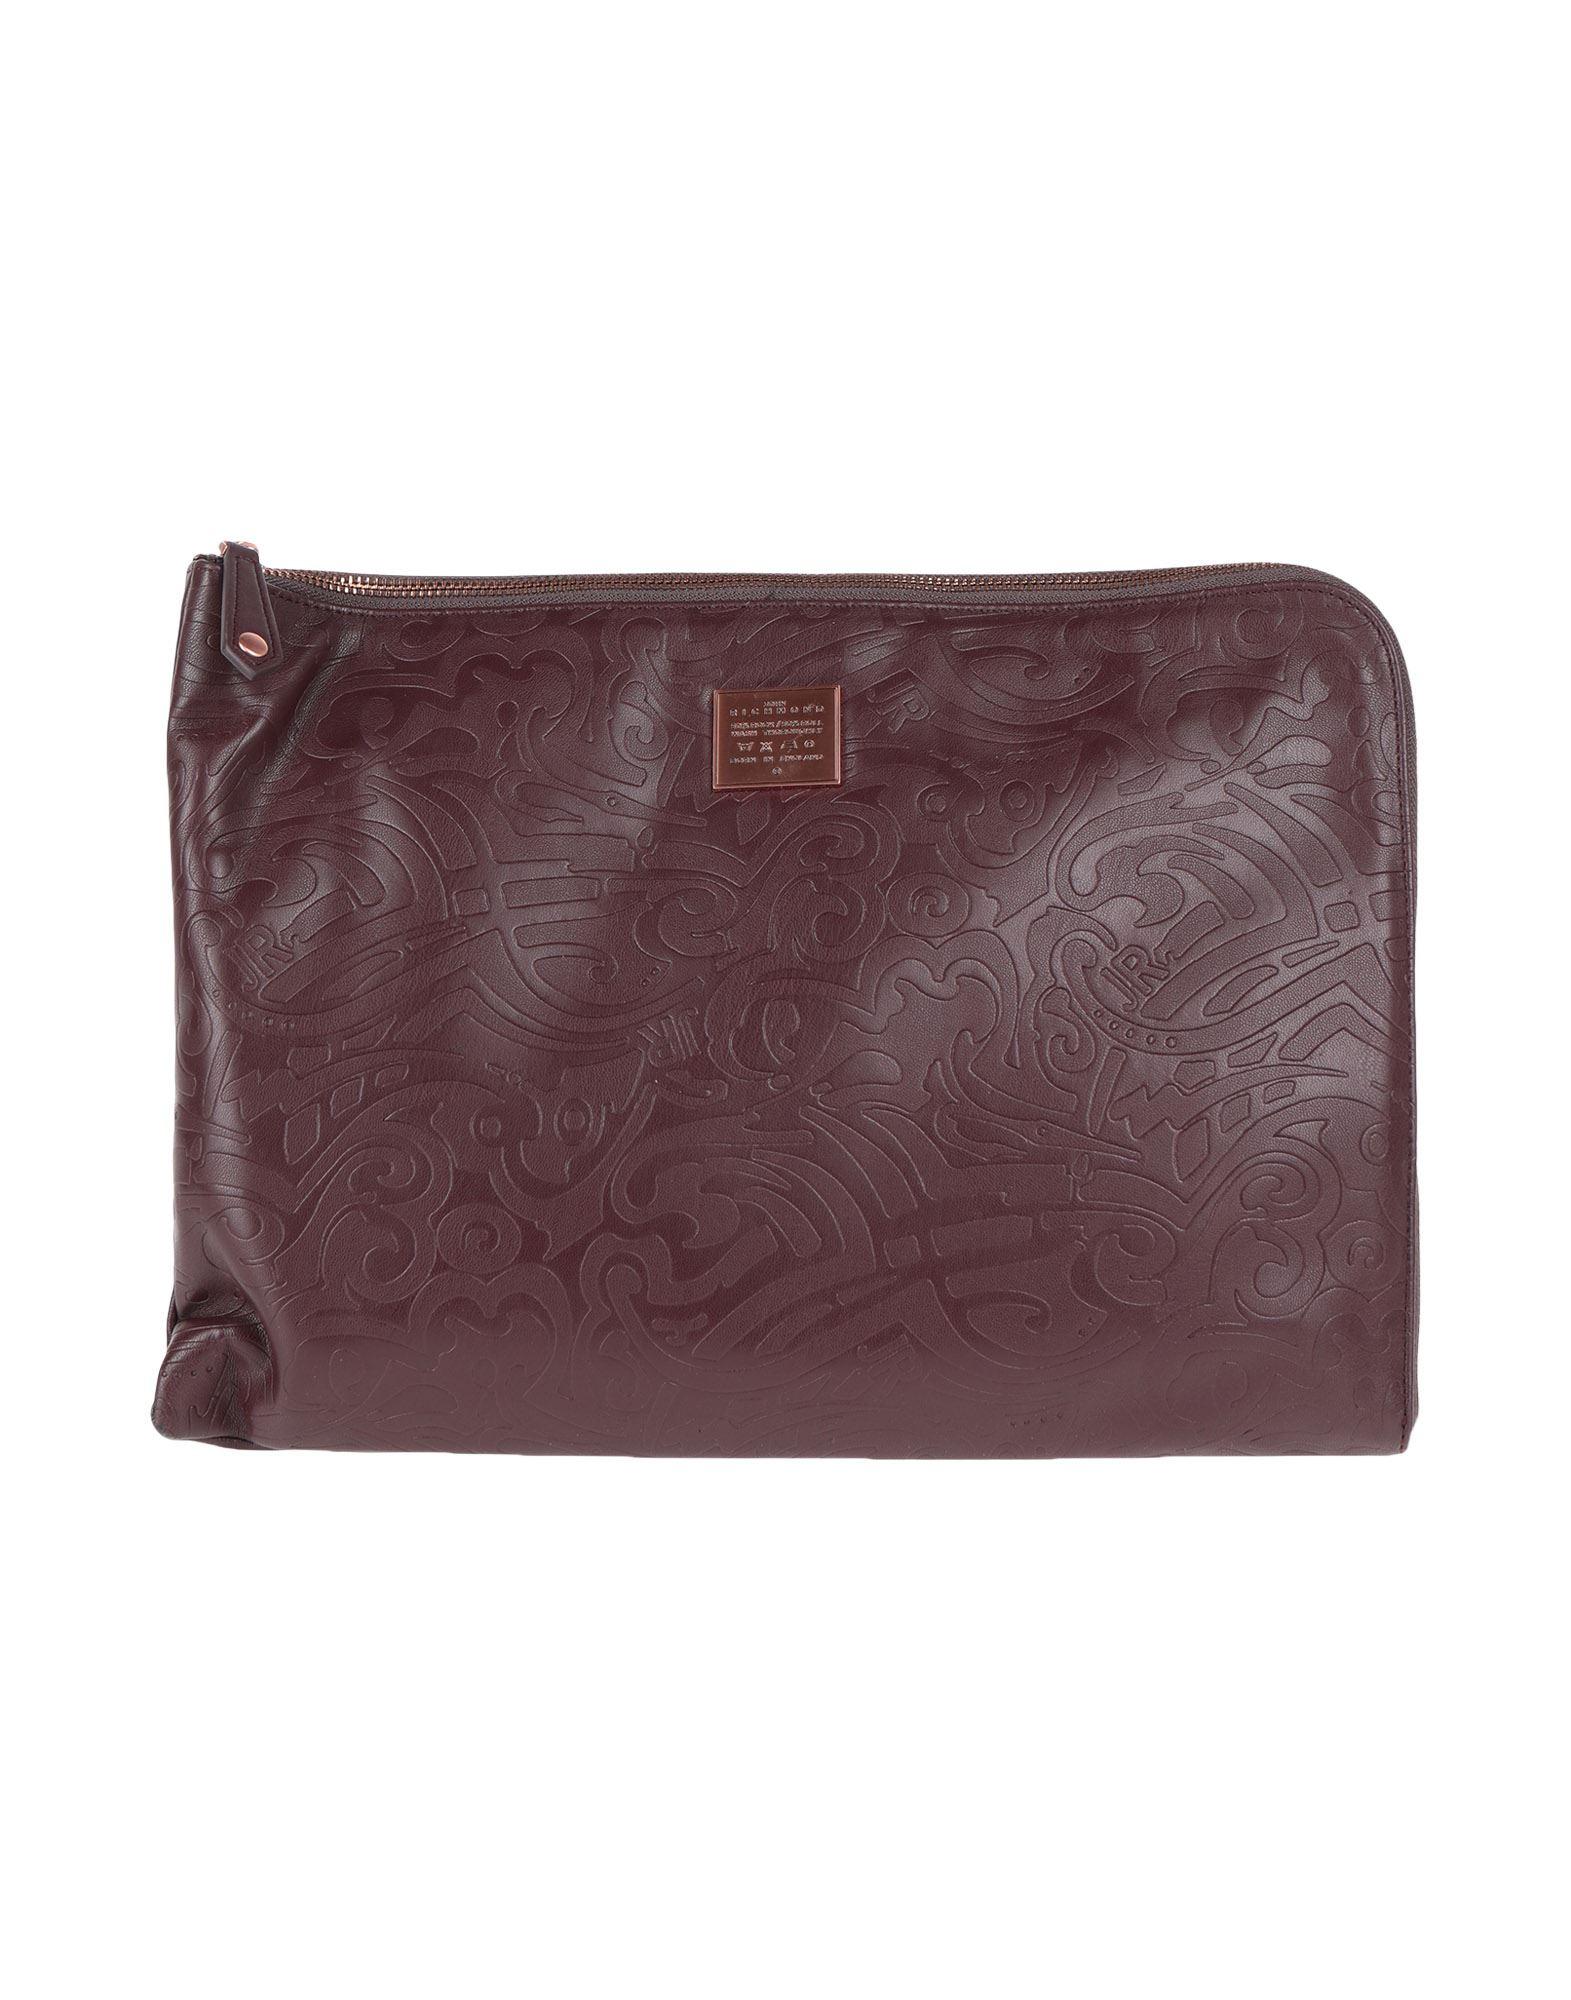 bertoni 1949 деловые сумки JOHN RICHMOND Деловые сумки